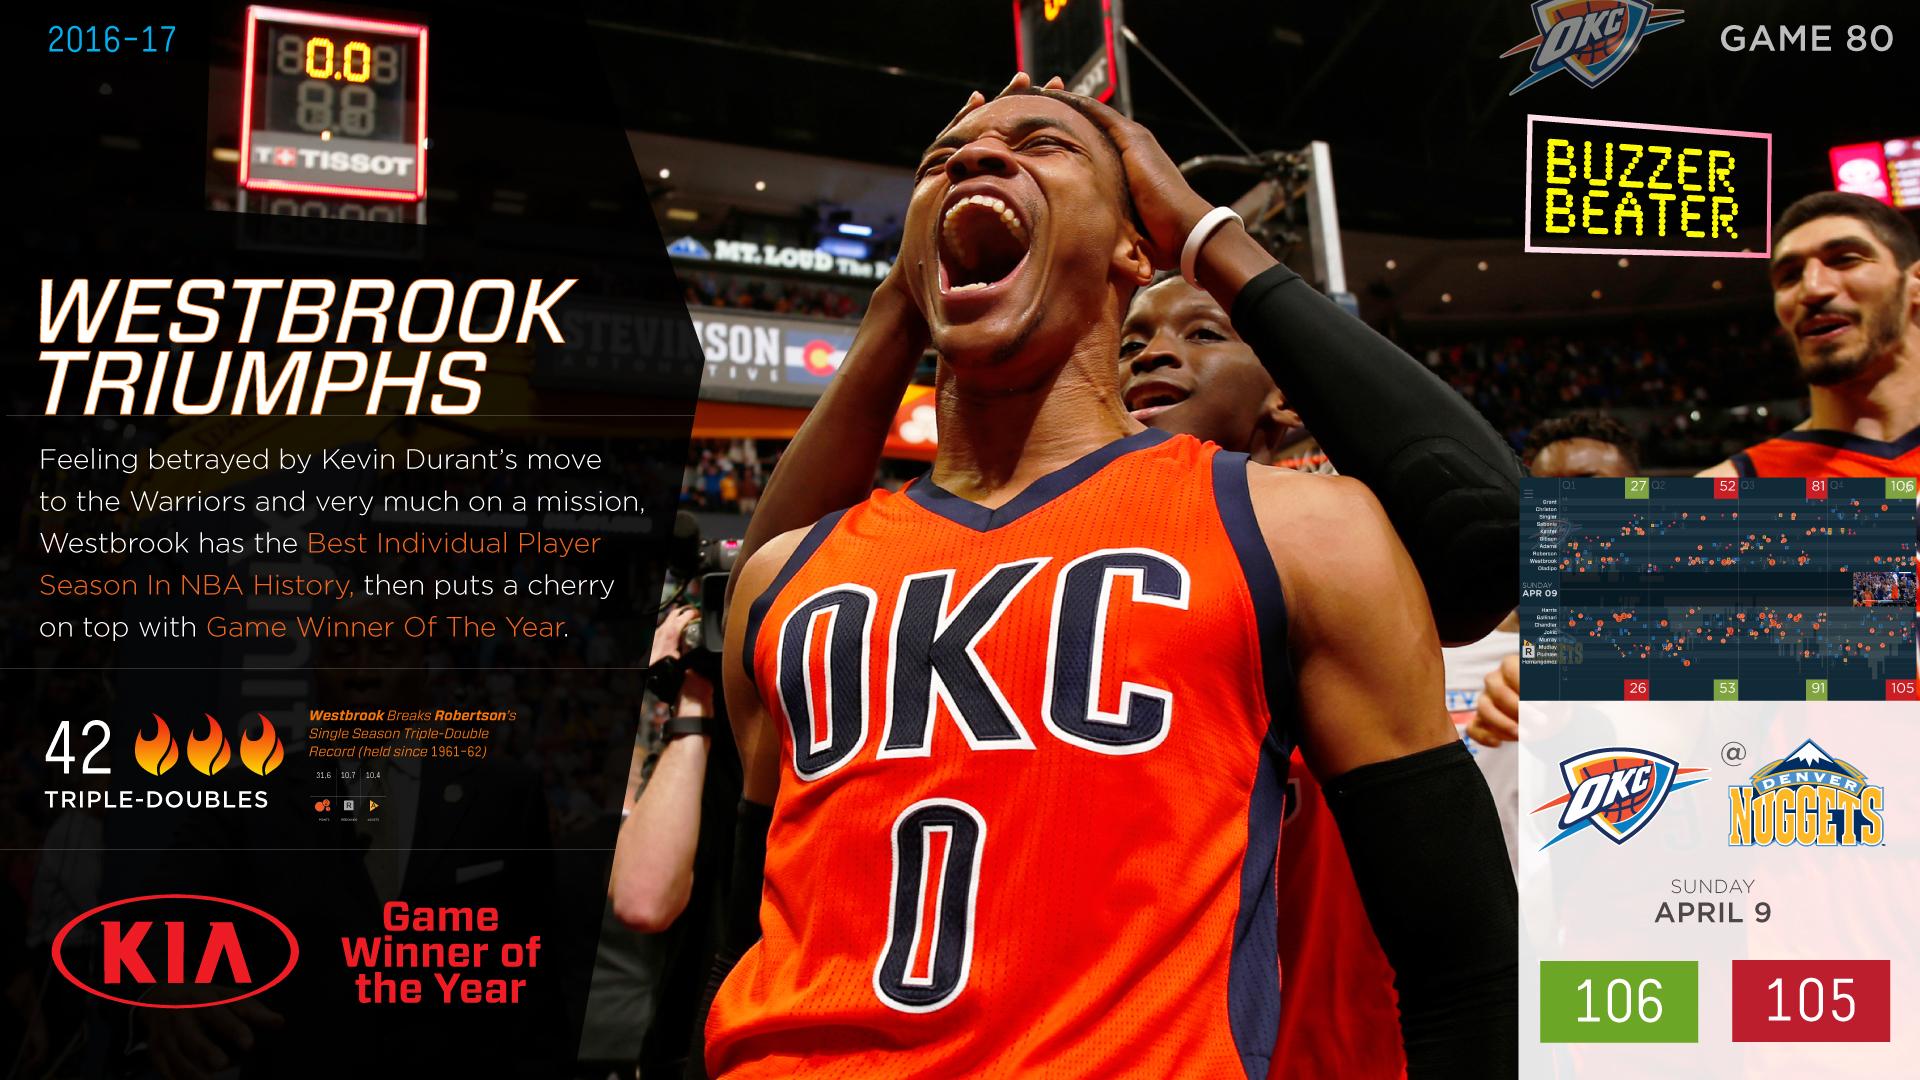 Westbrook Triumphs